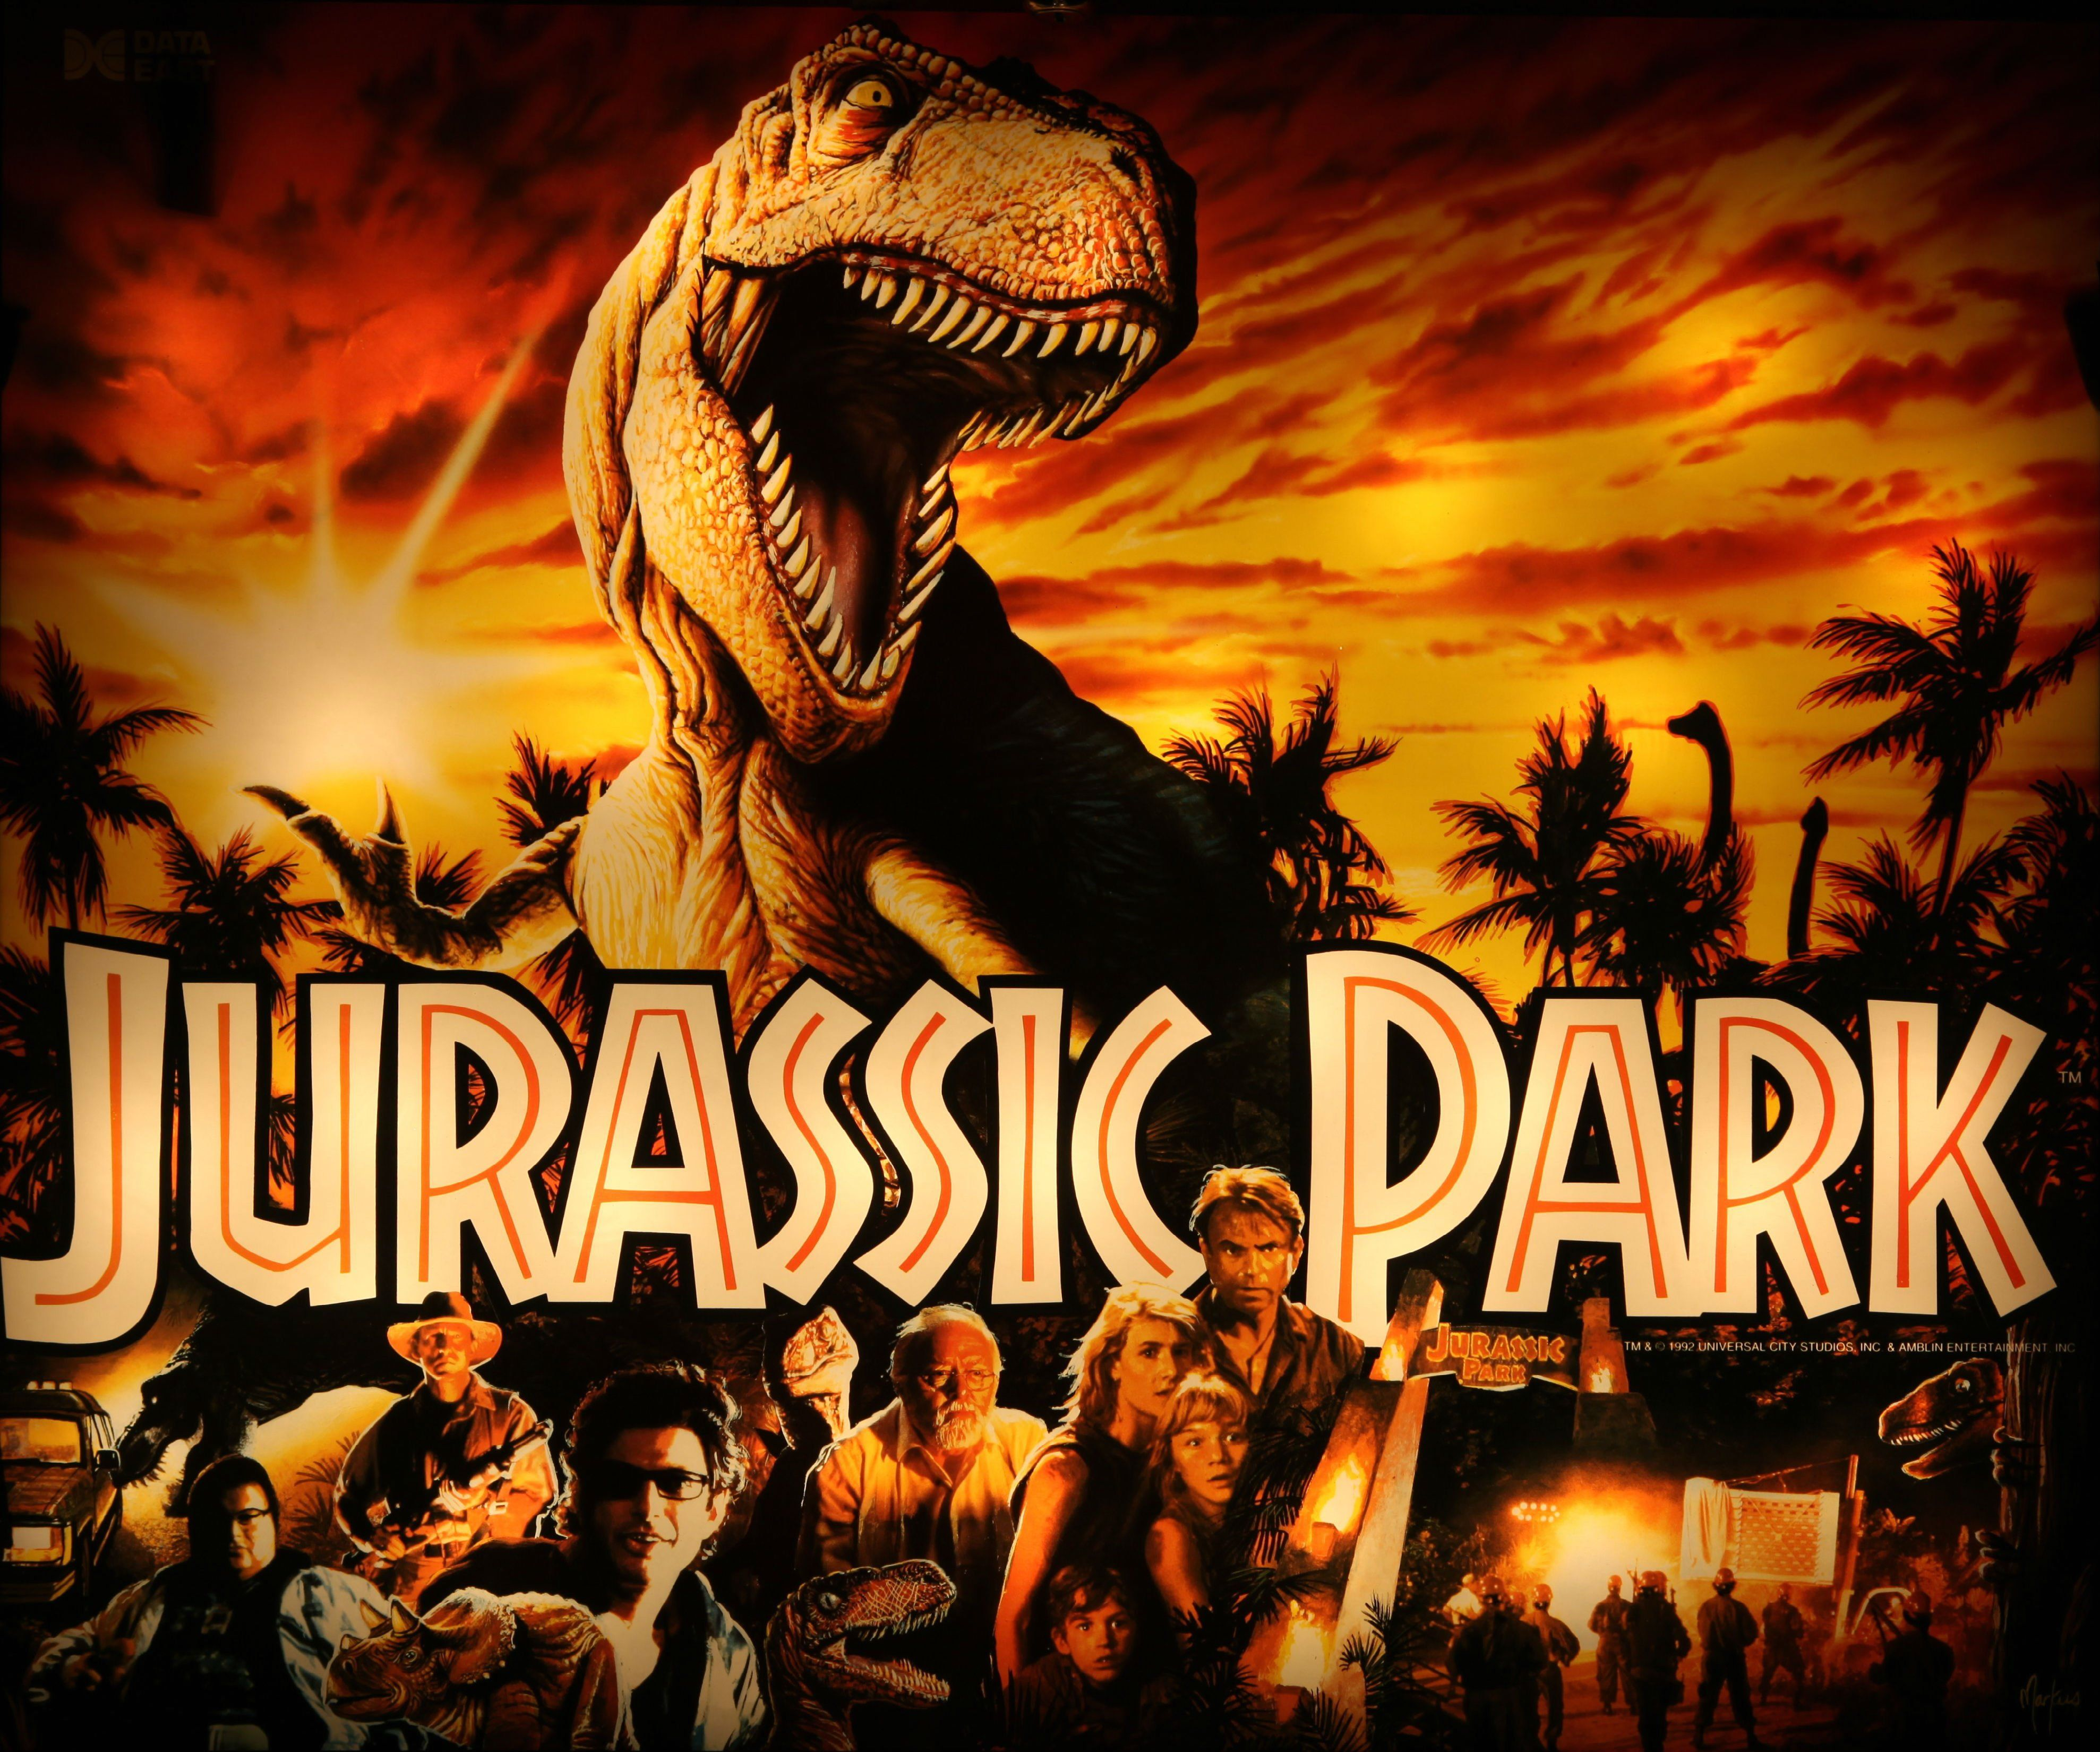 Original jurassic park movie poster